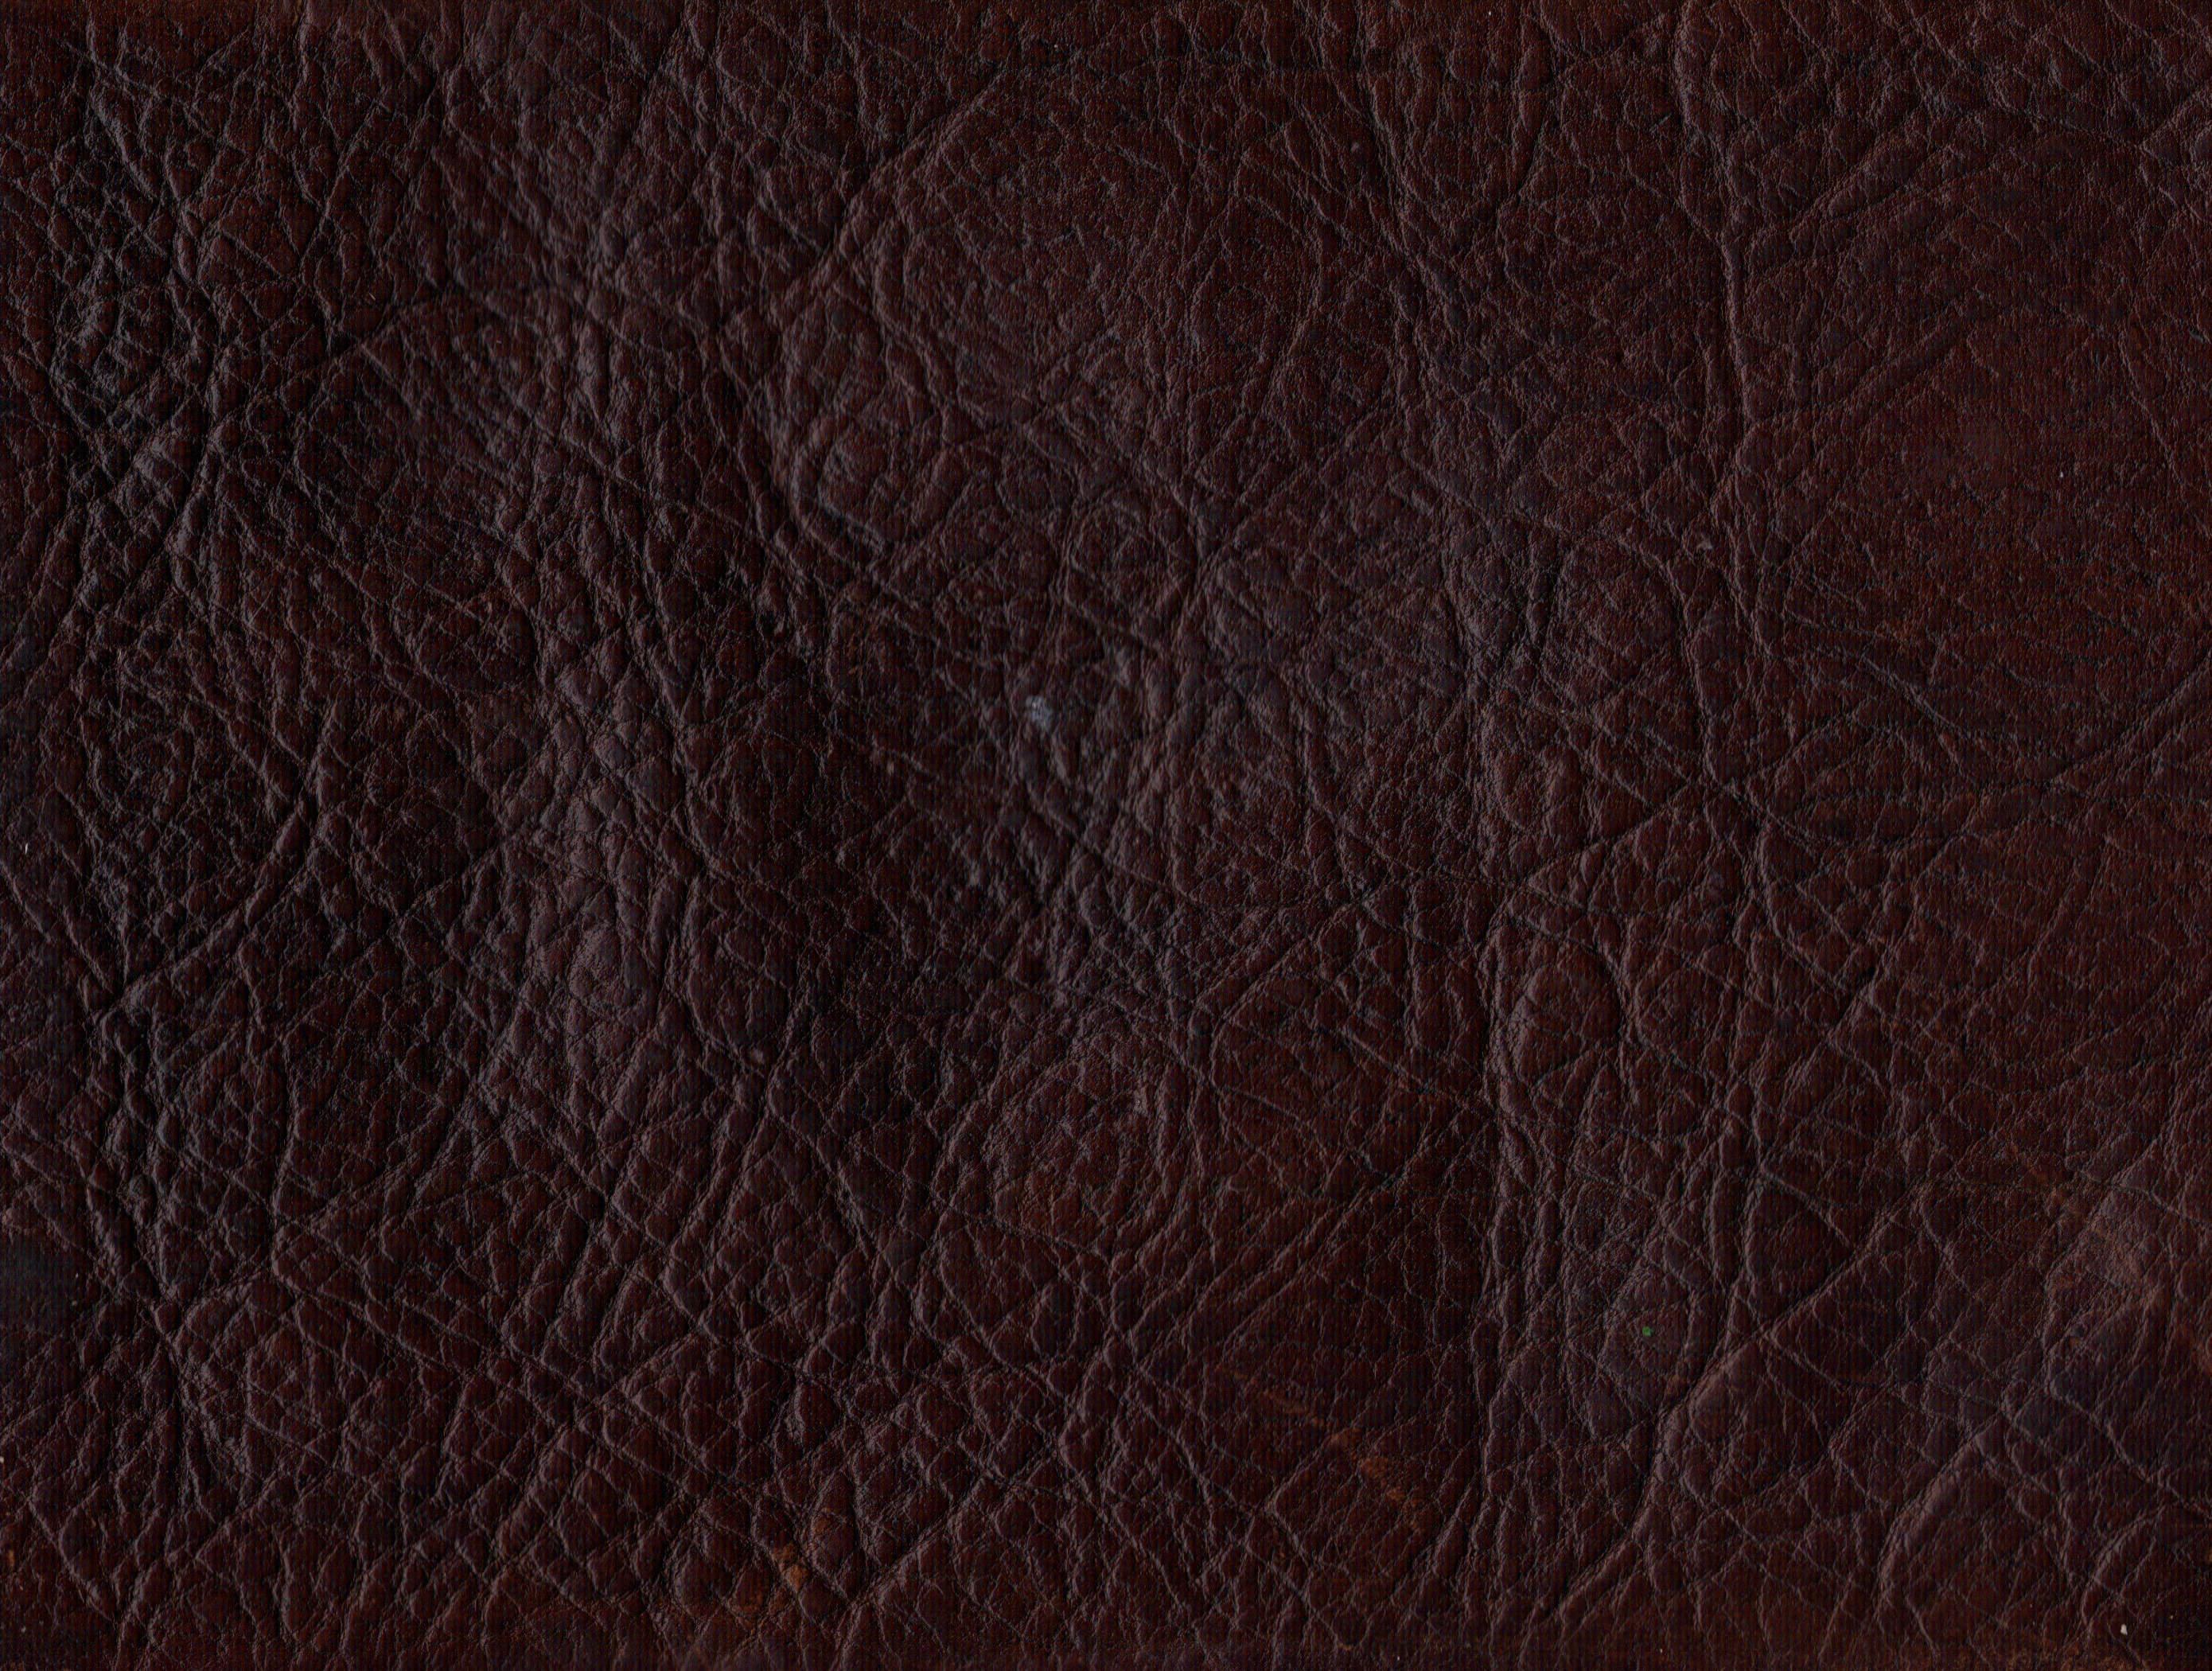 Dark Brown Leather Textures (JPG)